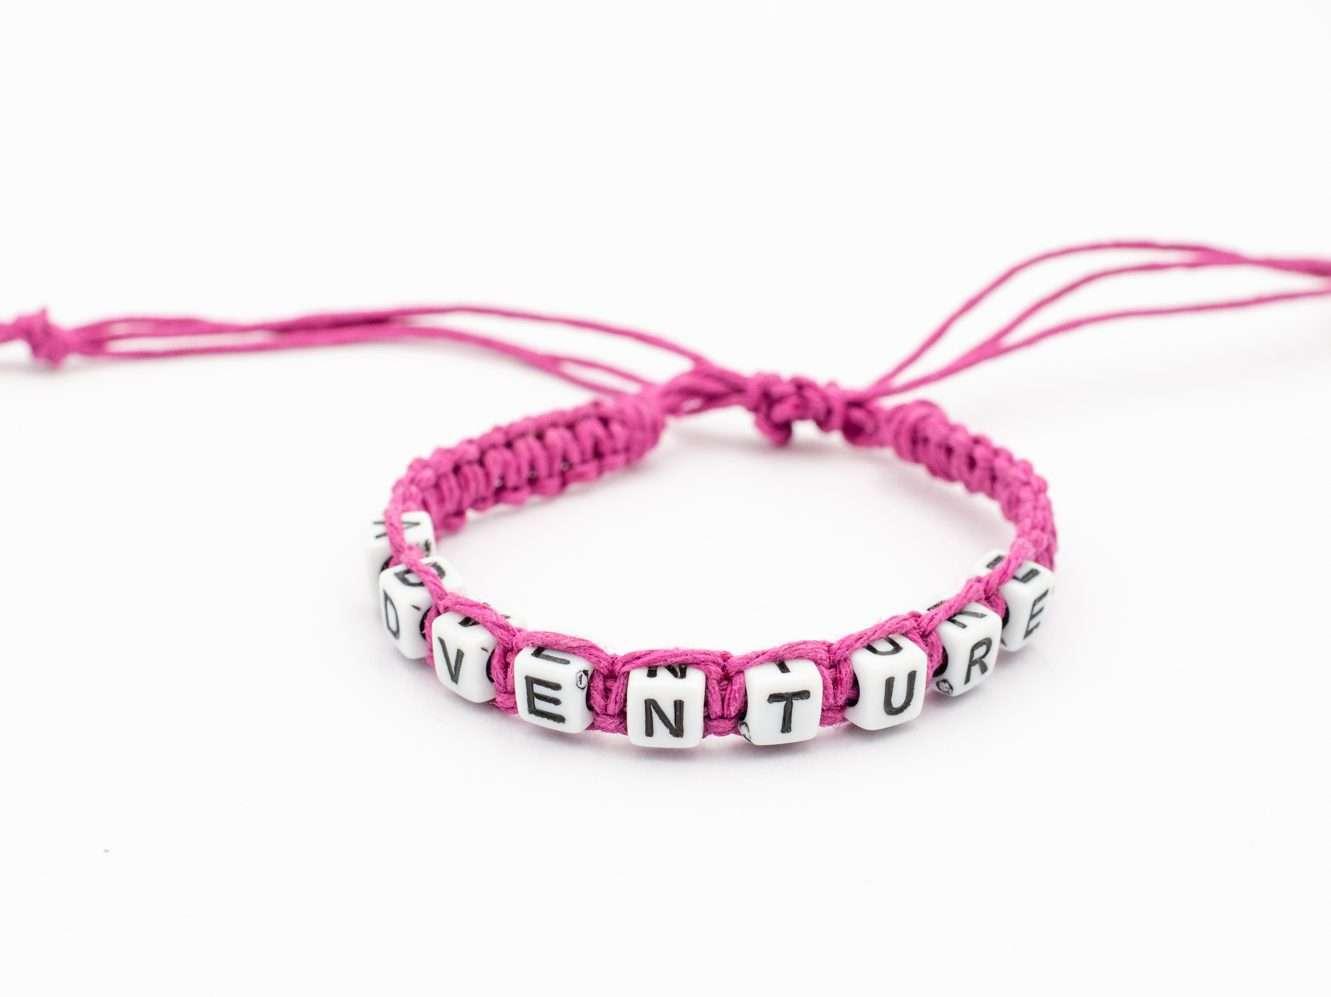 Hemp Bracelet Adventure Made To Order Hemp Beadery